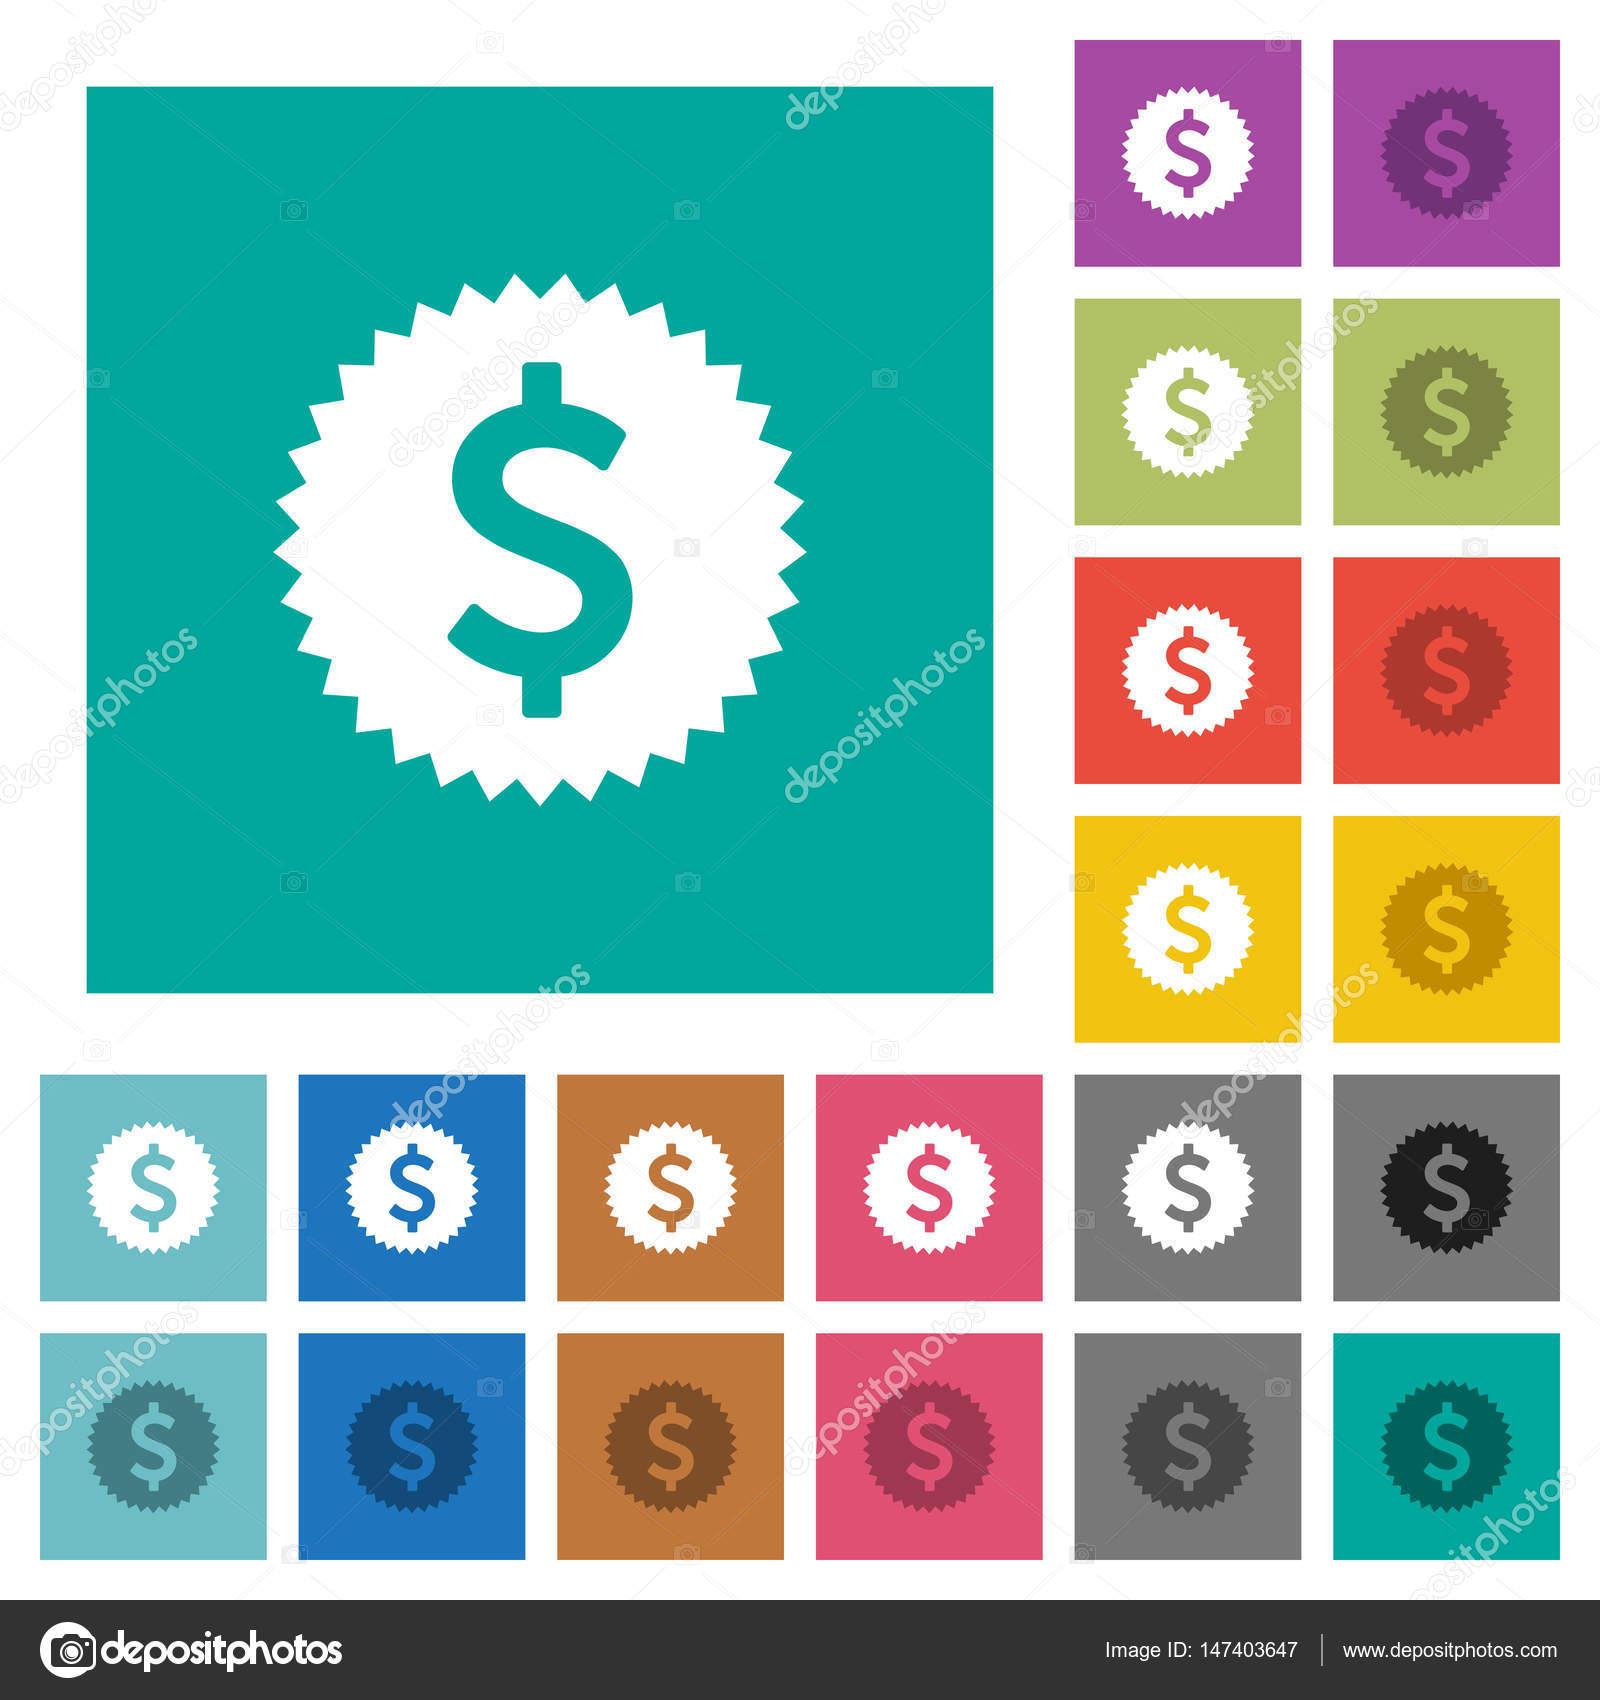 Картинки на рабочий стол макро доллары банкноты Деньги